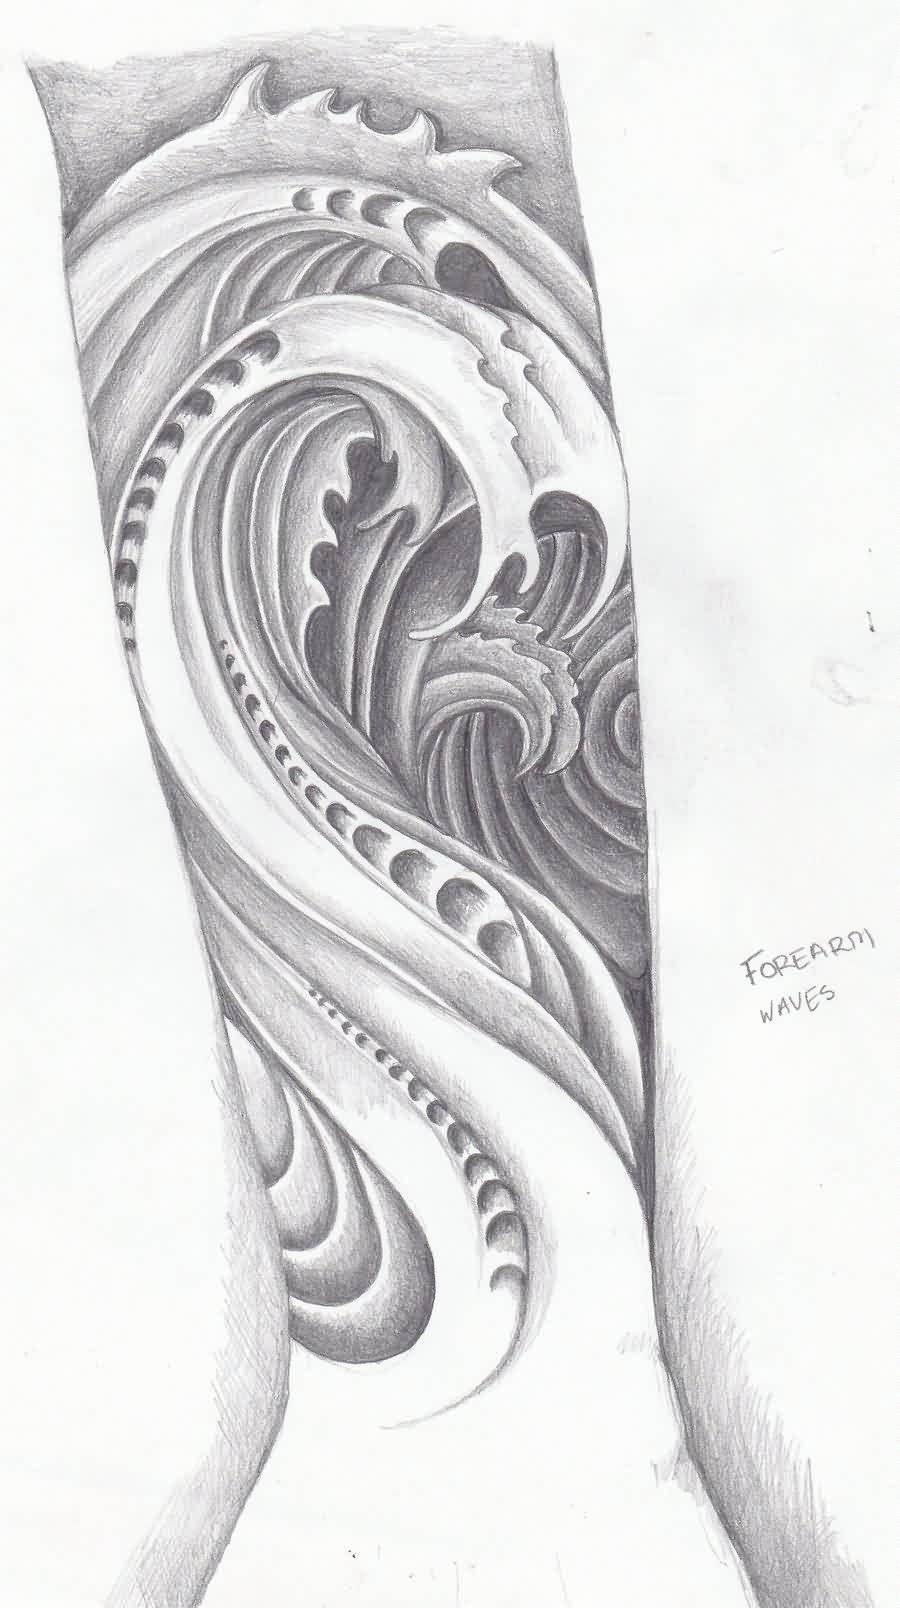 Bio Wave Tattoo On Sleeve Tattoes Idea 2015 2016 Waves Tattoo Tattoos Japanese Wave Tattoos